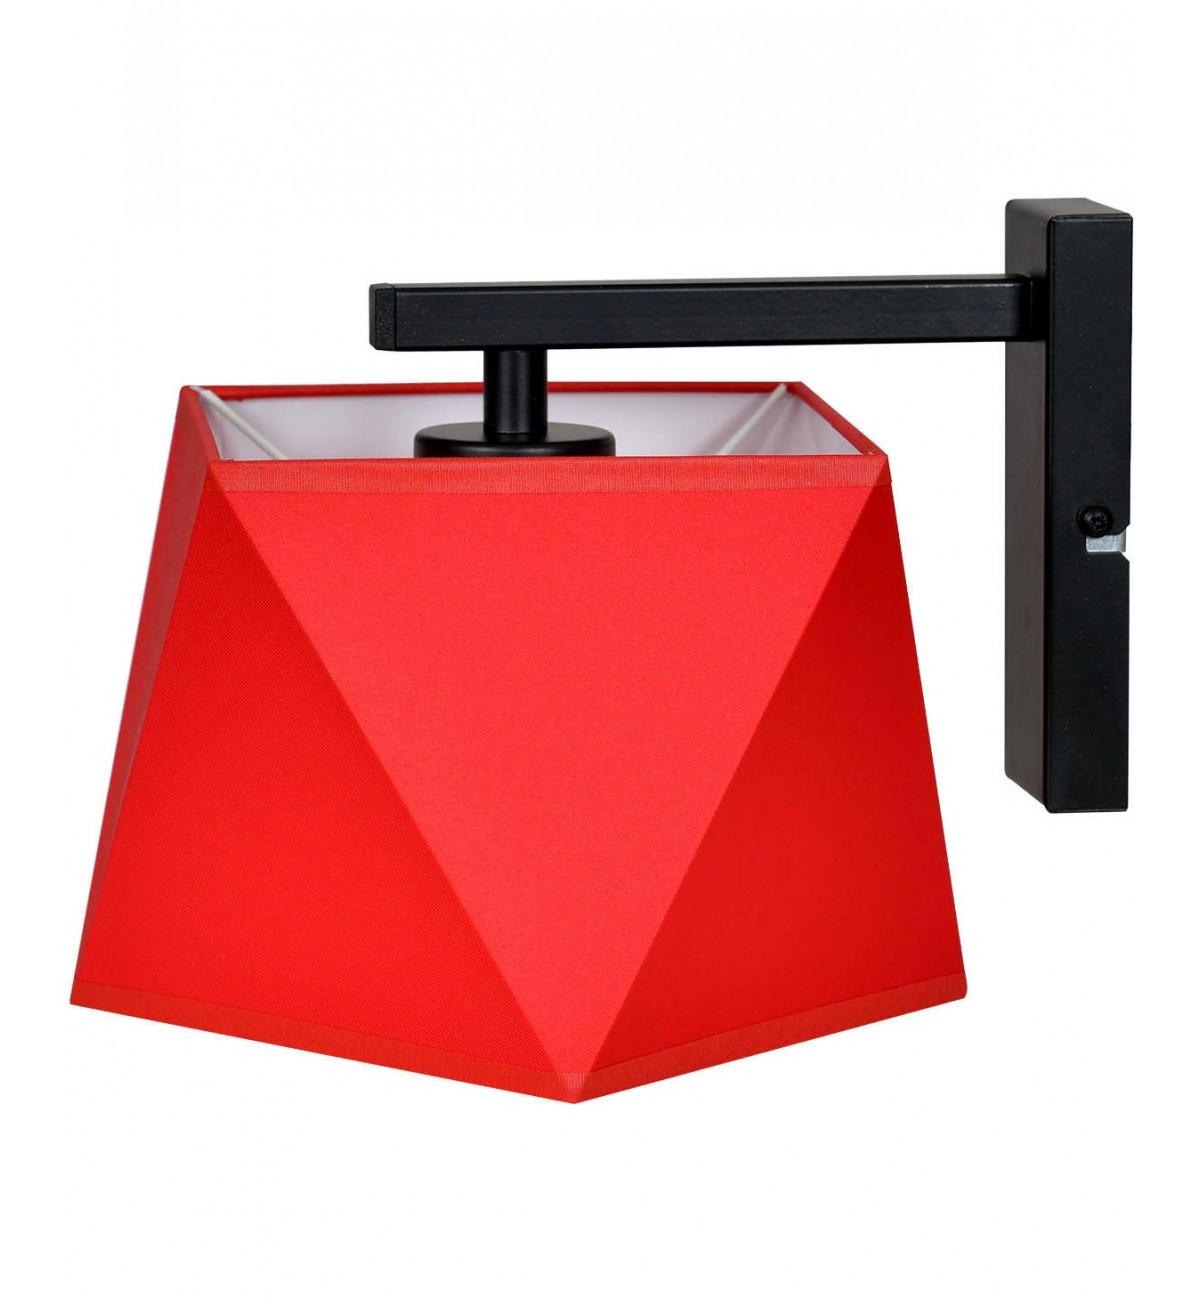 oryginalna lampa kinkiet diament material Lampa Kinkiet Diament Materiał